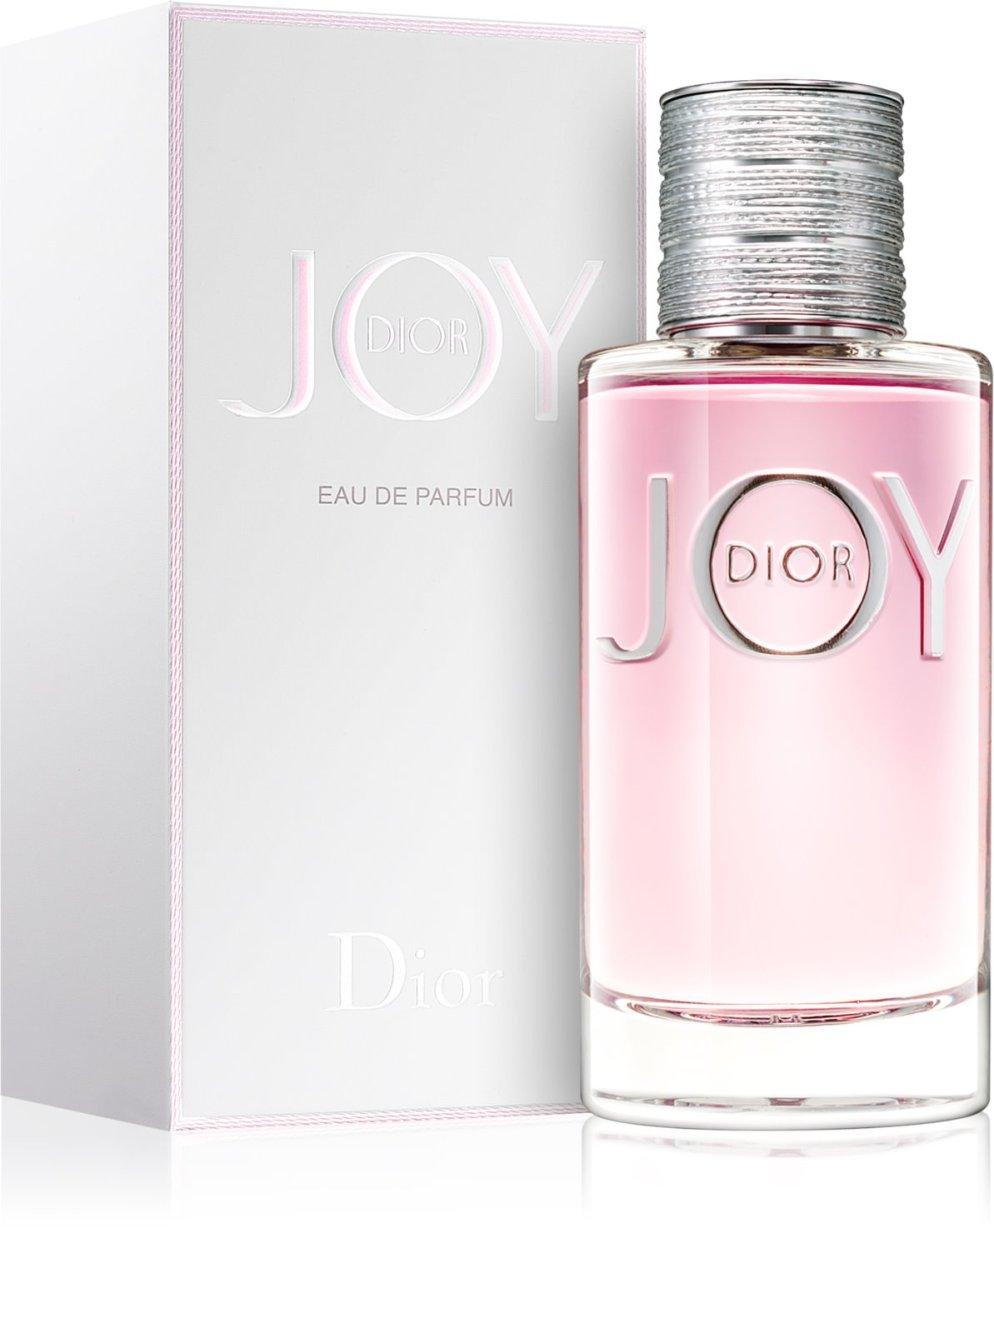 dior-joy-by-eau-de-parfum-pentru-femei-90-ml___6.jpg